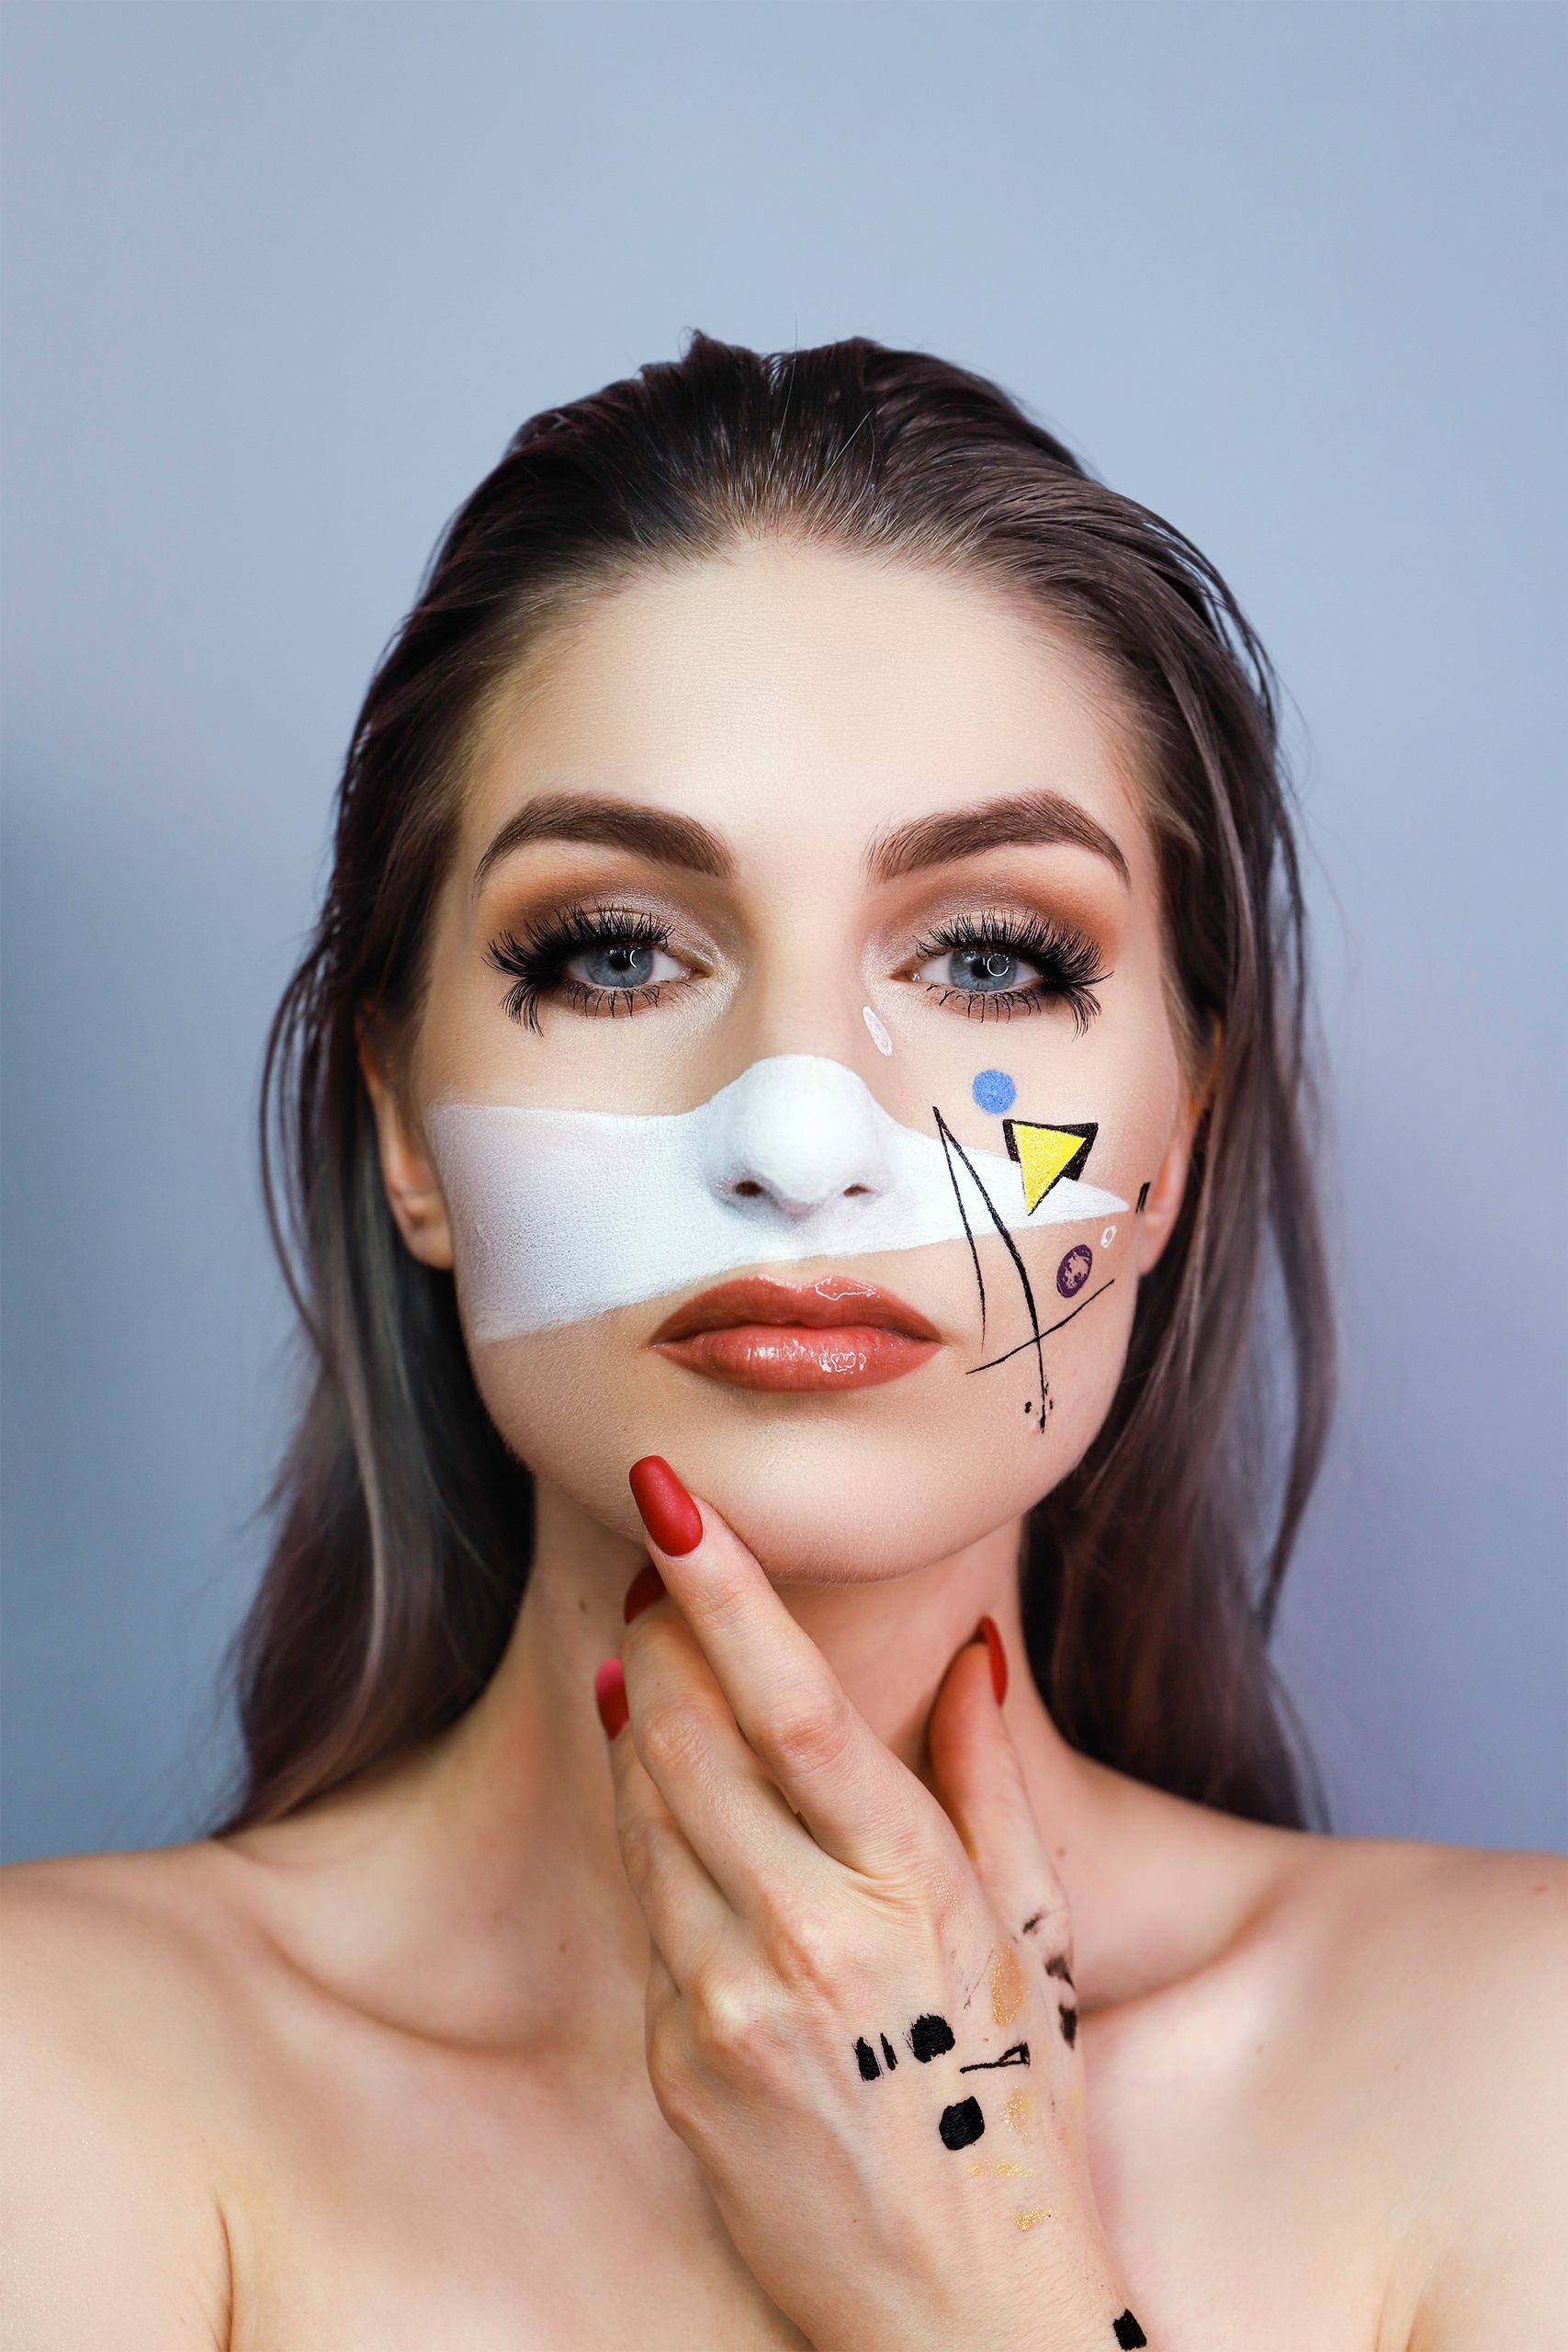 Make-up inspirowany obrazem. 'Kompozycja_VIII' by Wassily_Kandinsky